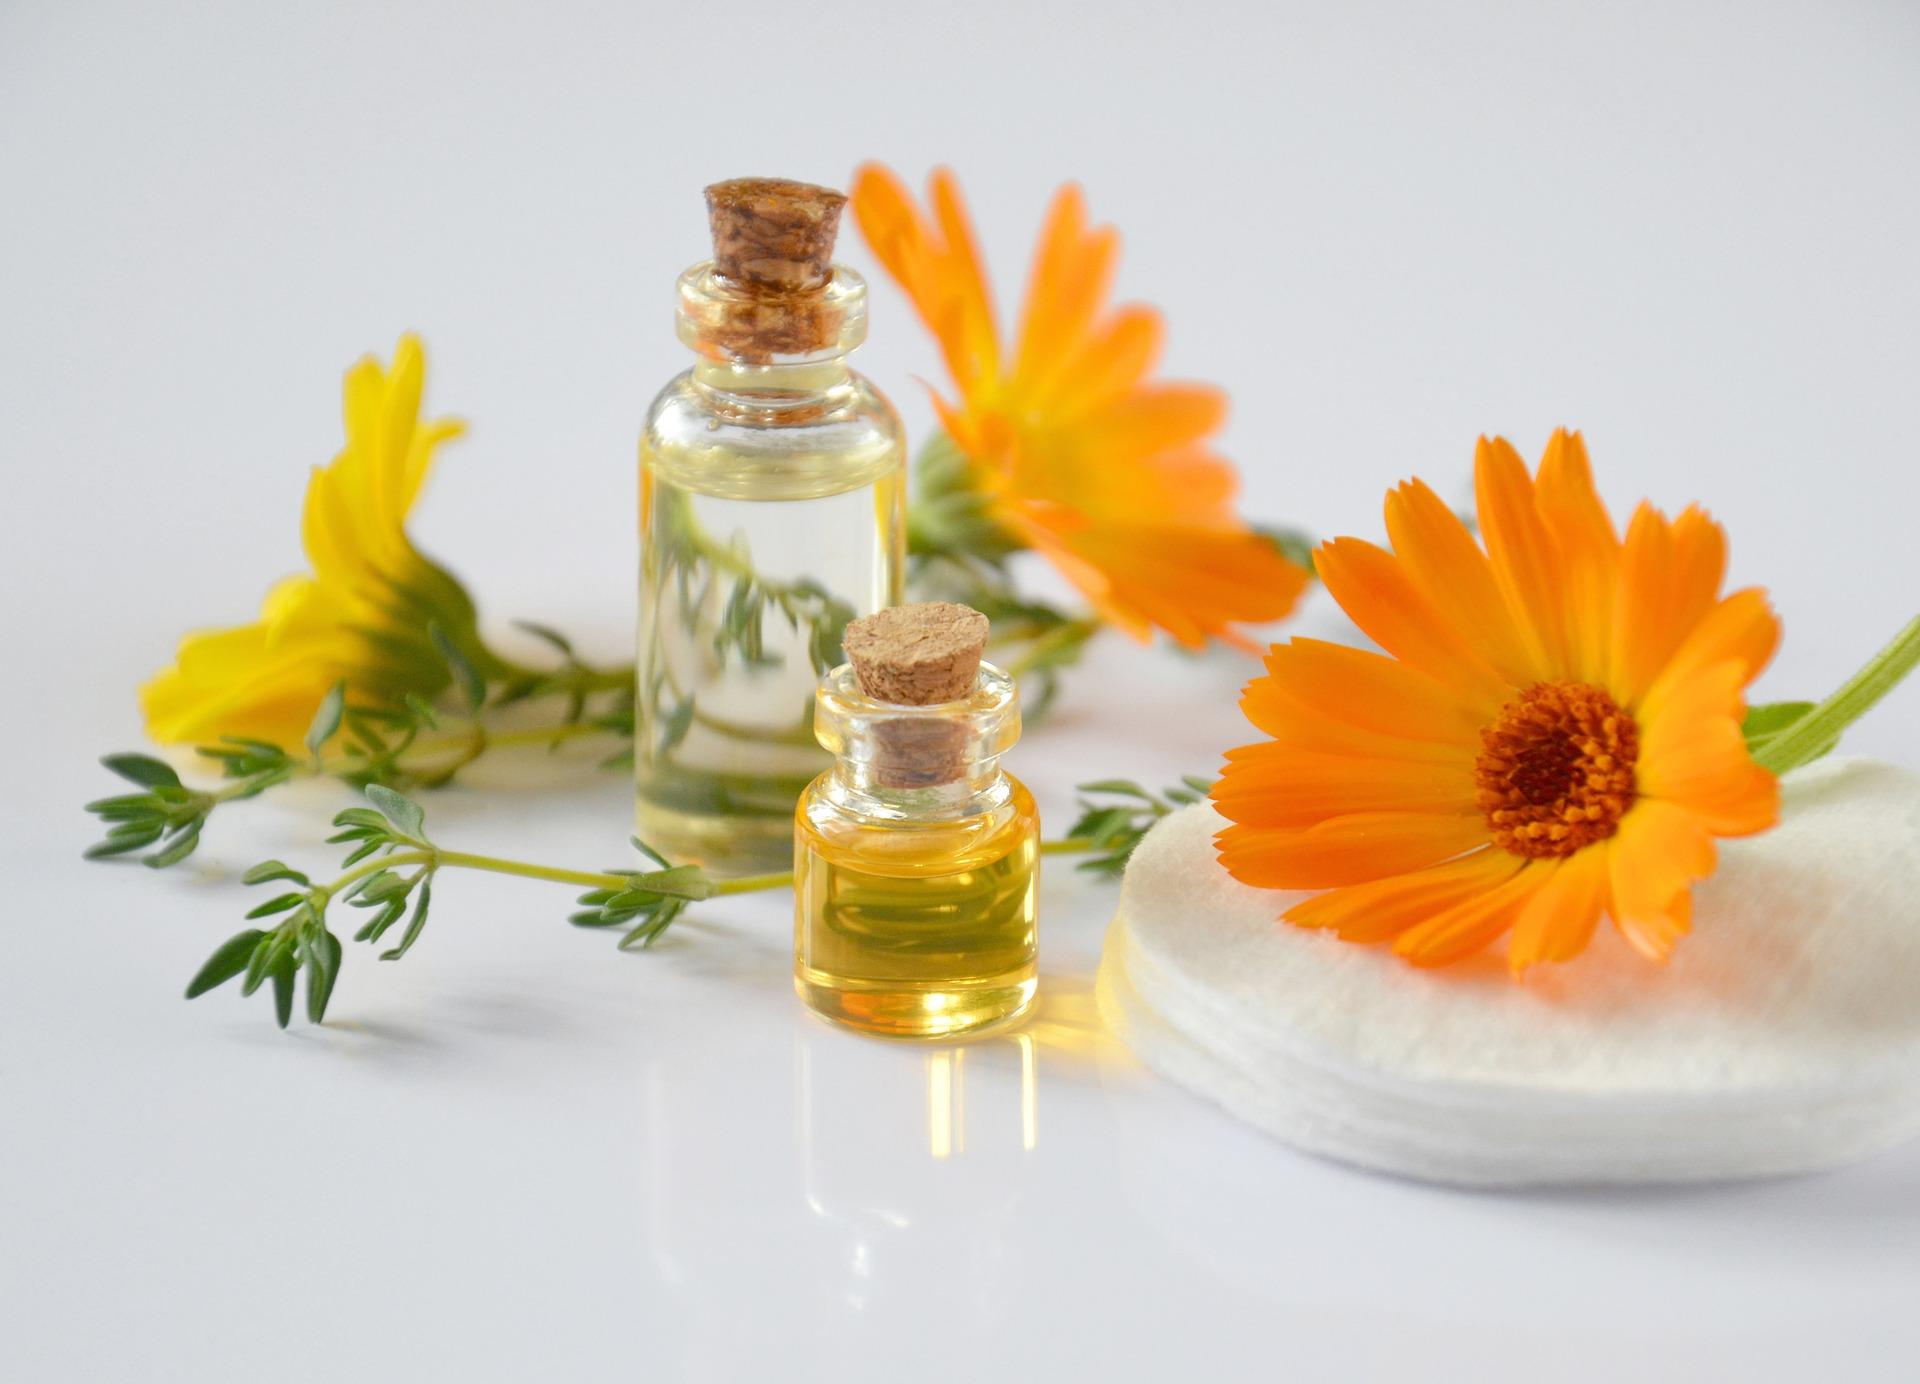 essential-oils-2738555_1920.jpg